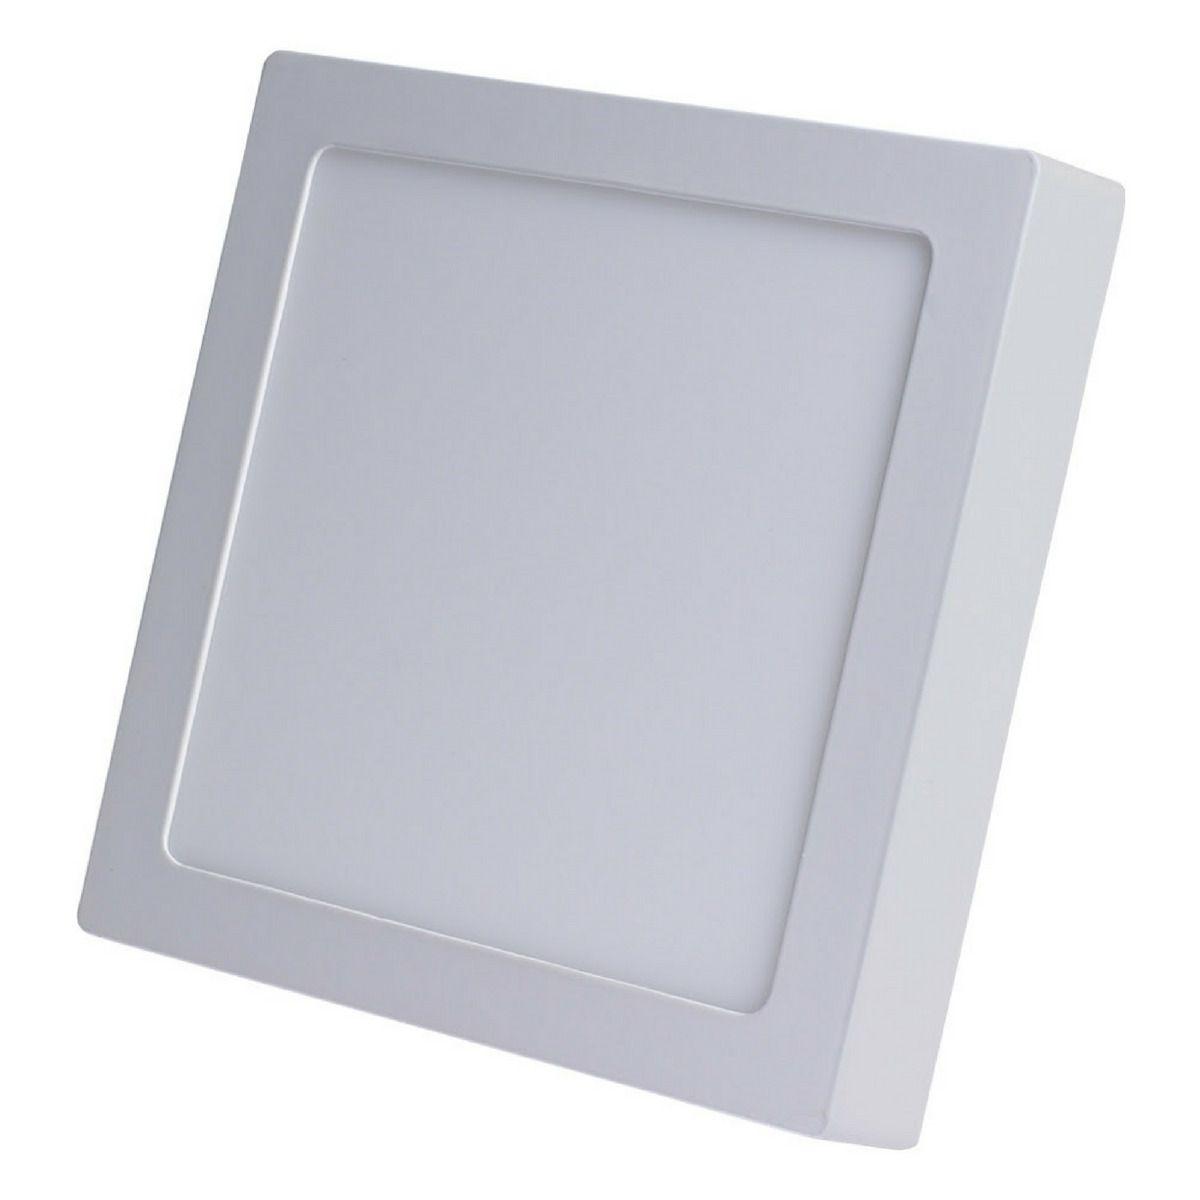 Kit 10 Painel Plafon Led Sobrepor Quadrado 24w - Luz Branca